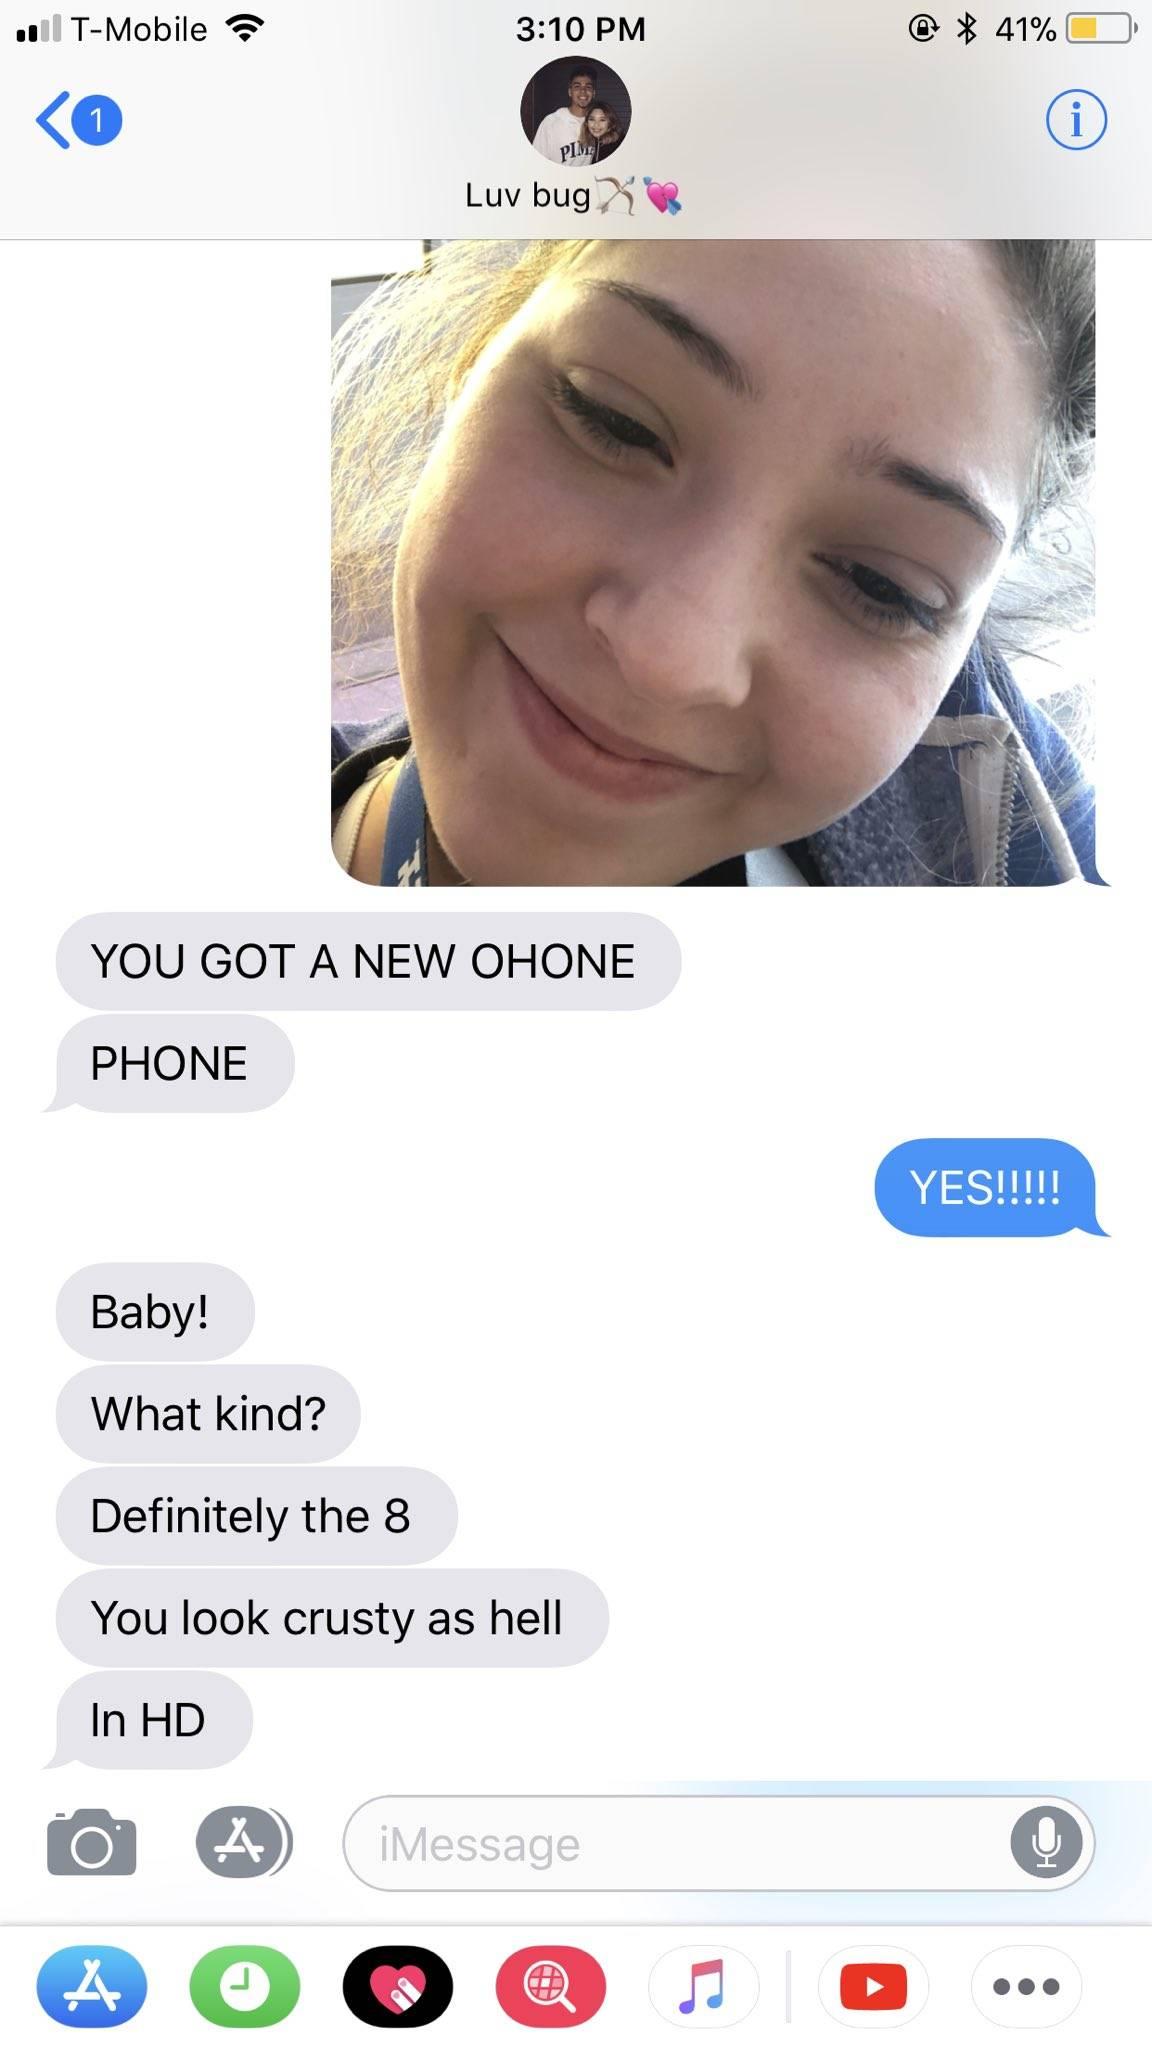 New phone selfie on iPhone